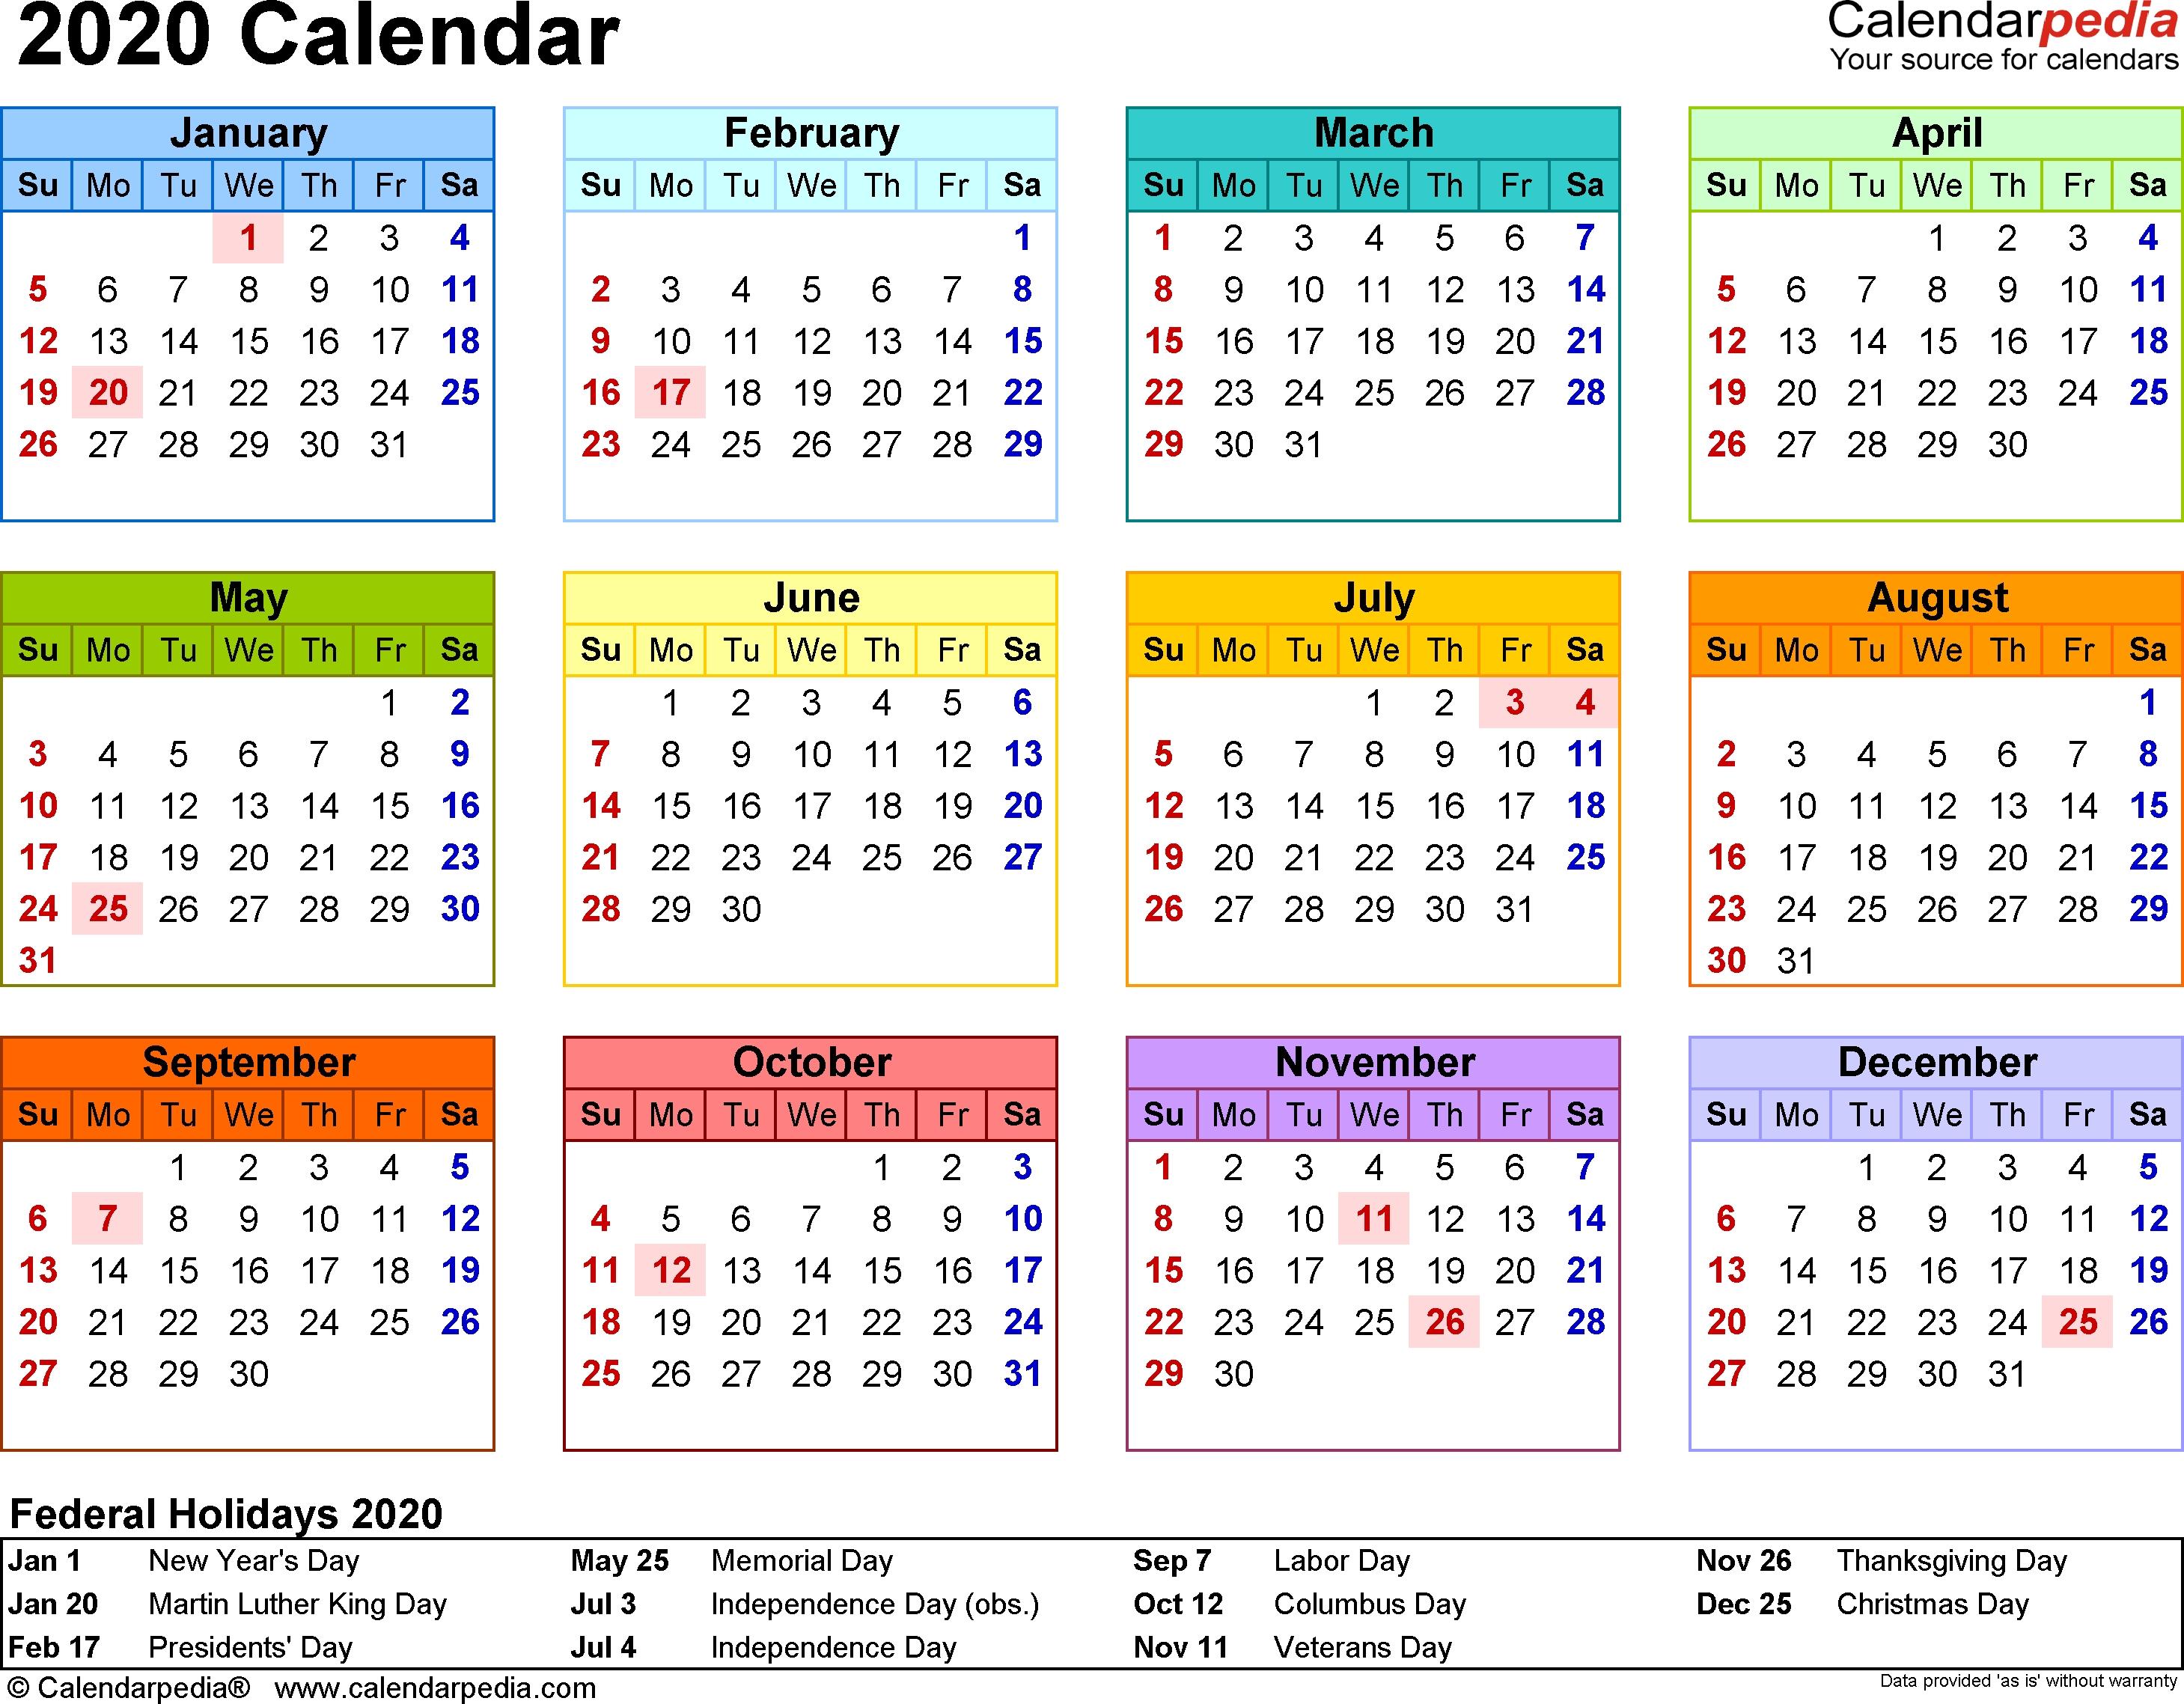 2020 Calendar - 17 Free Printable Word Calendar Templates regarding Monthly Printable Calendars 2020 Half Page